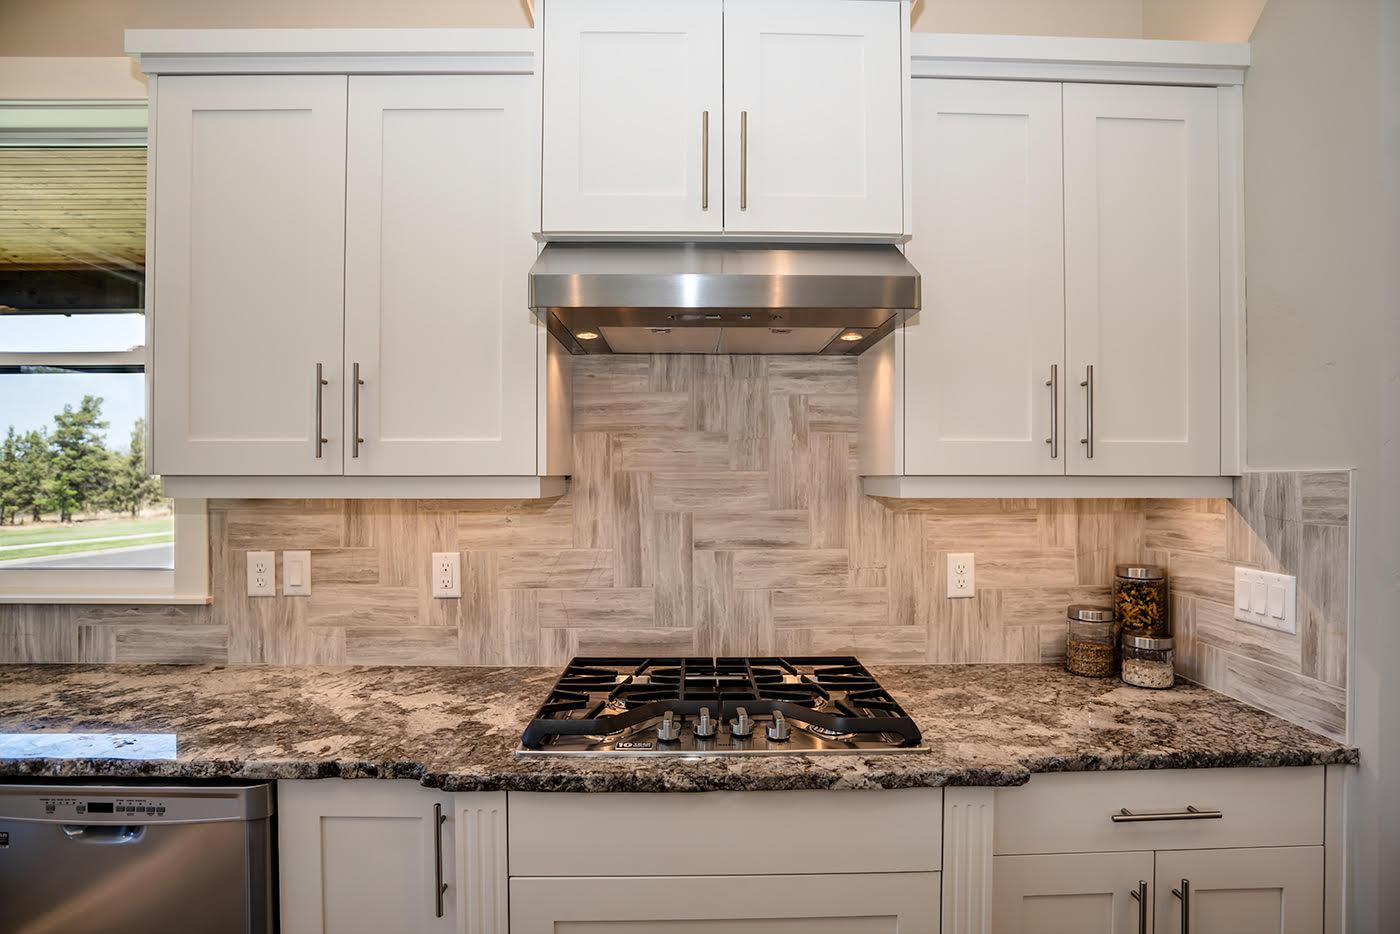 Kitchen-Remodel-Backsplash-Redmond-Oregon.jpg